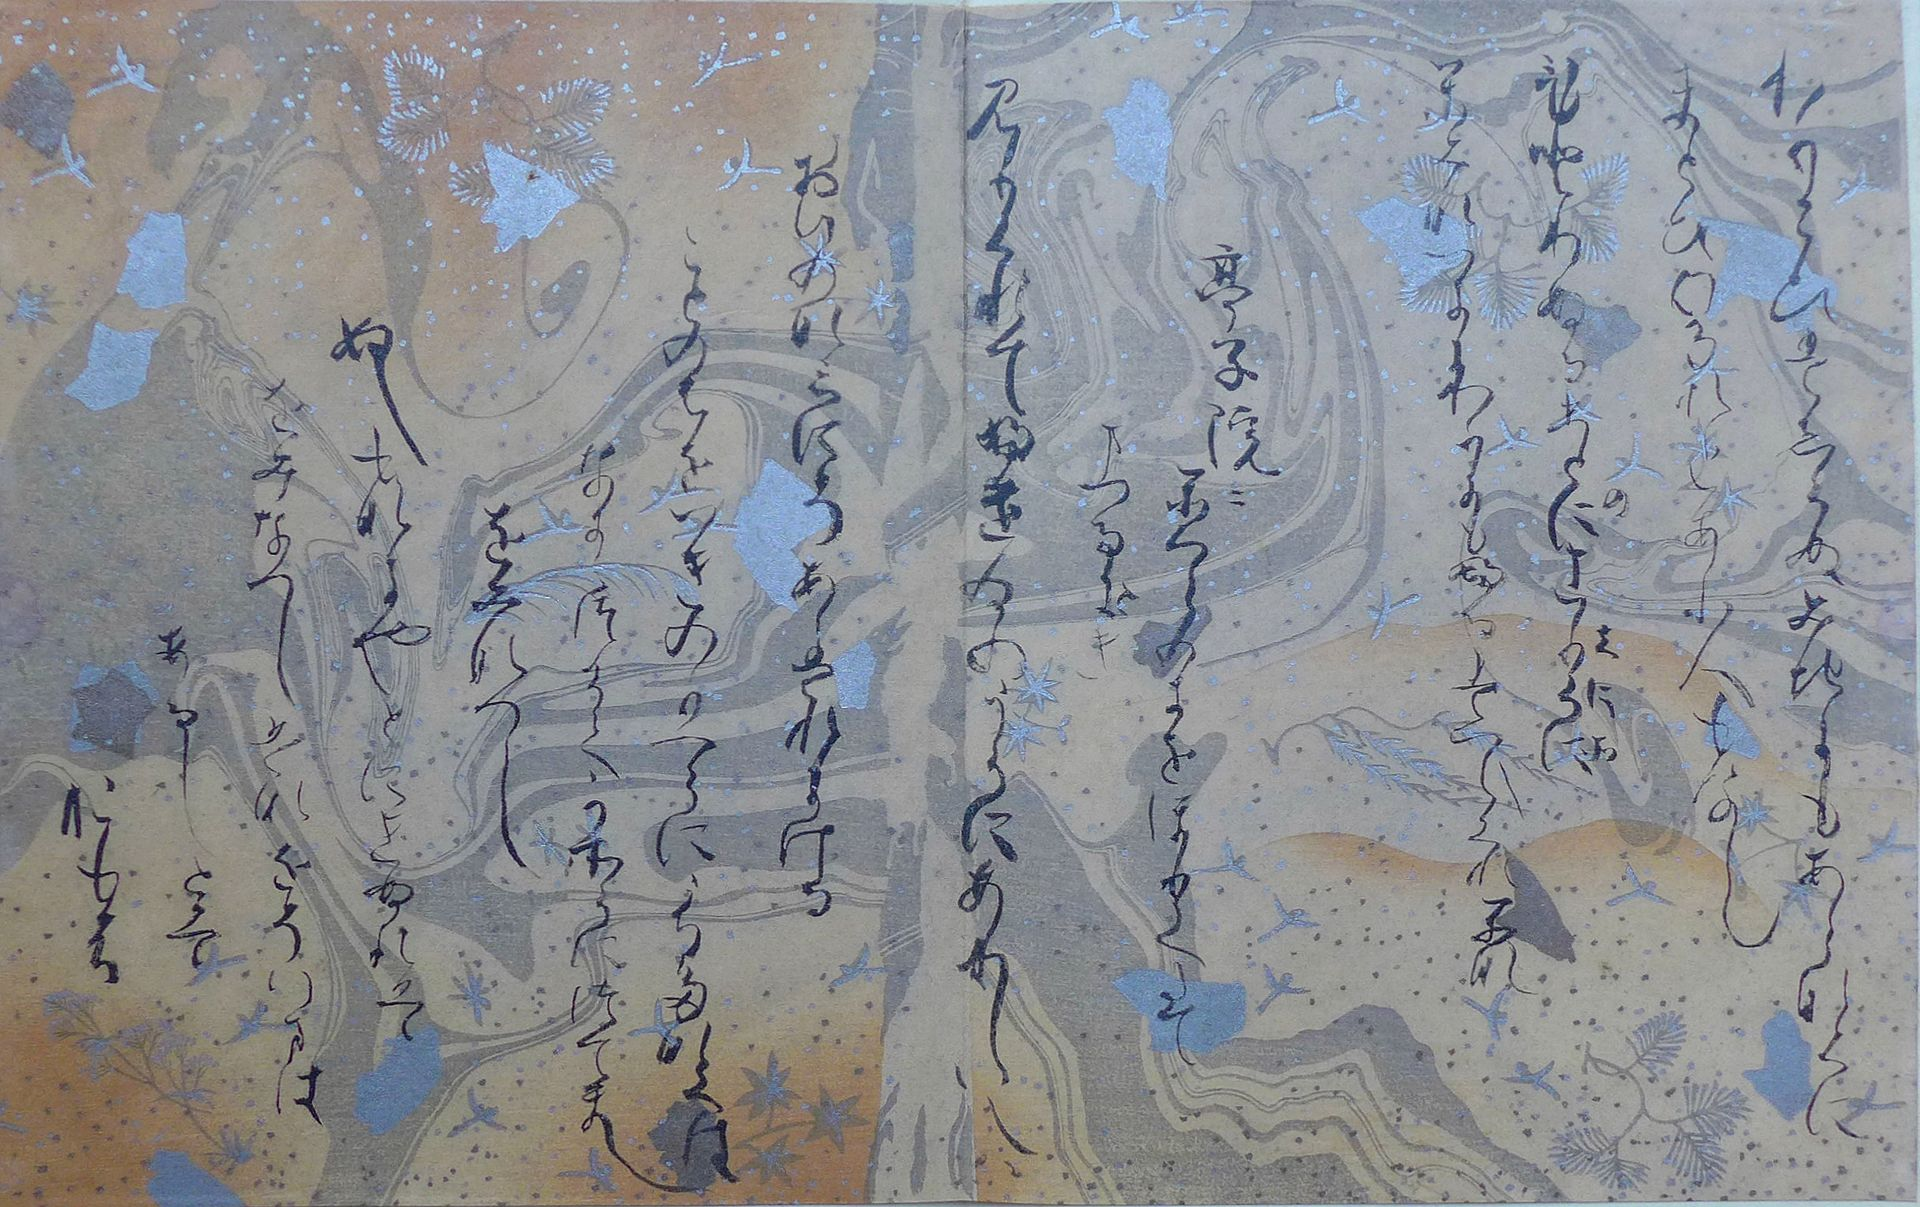 An early example from the Sanjuurokuninshuu. Image via Wikipedia